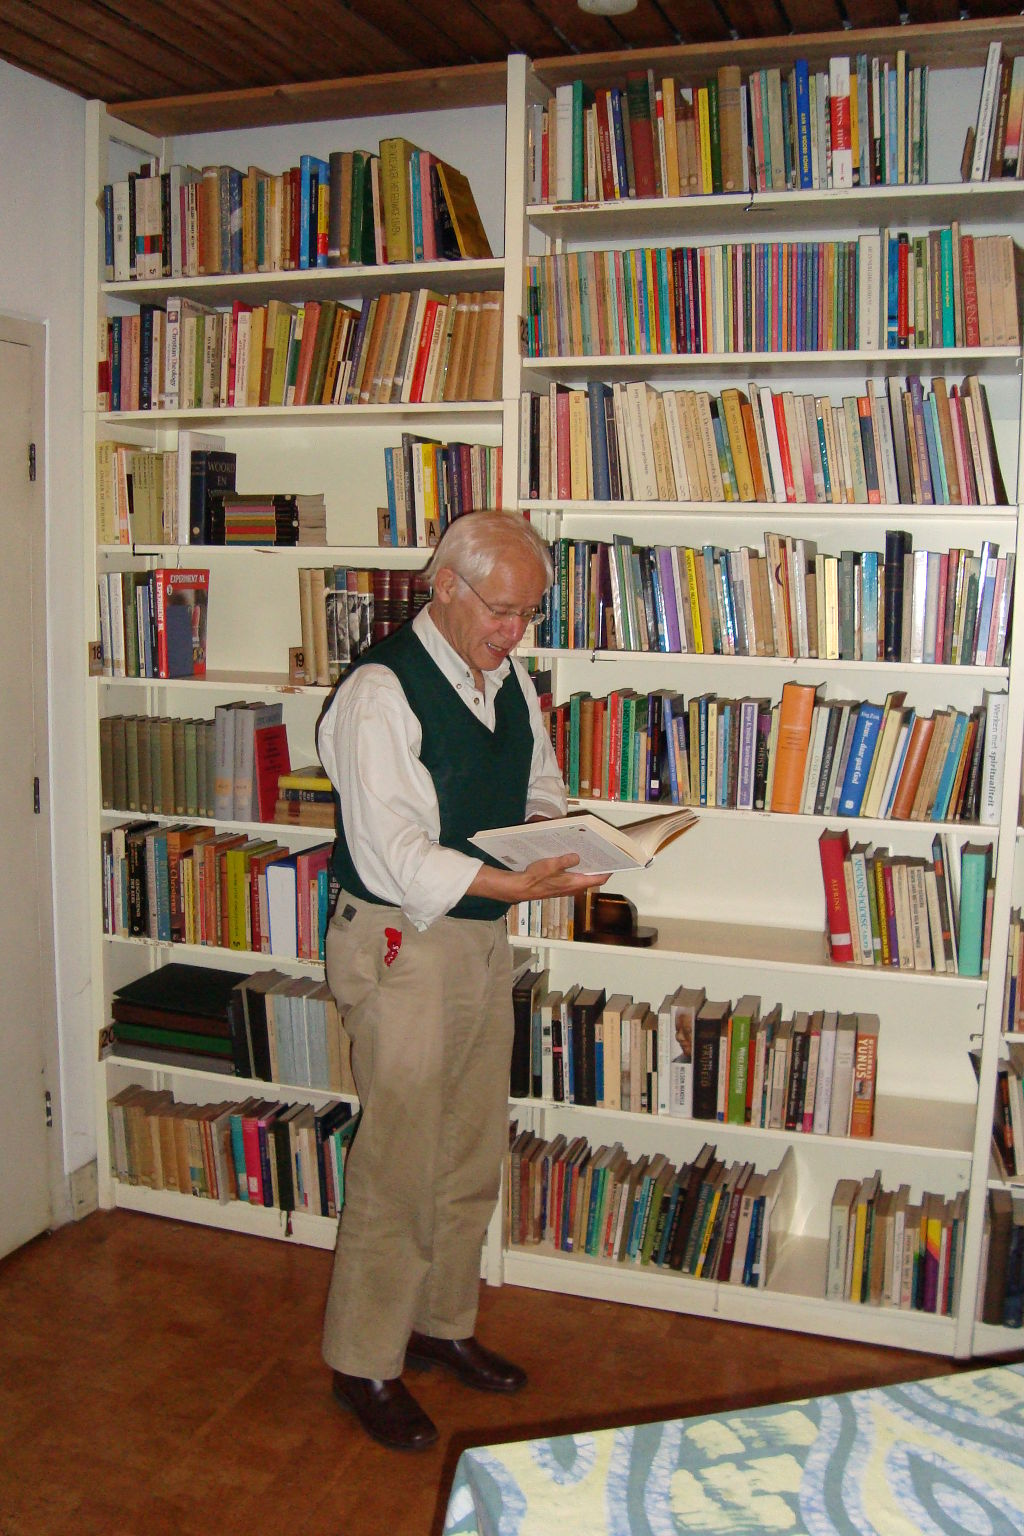 Bibliotheek met Paul